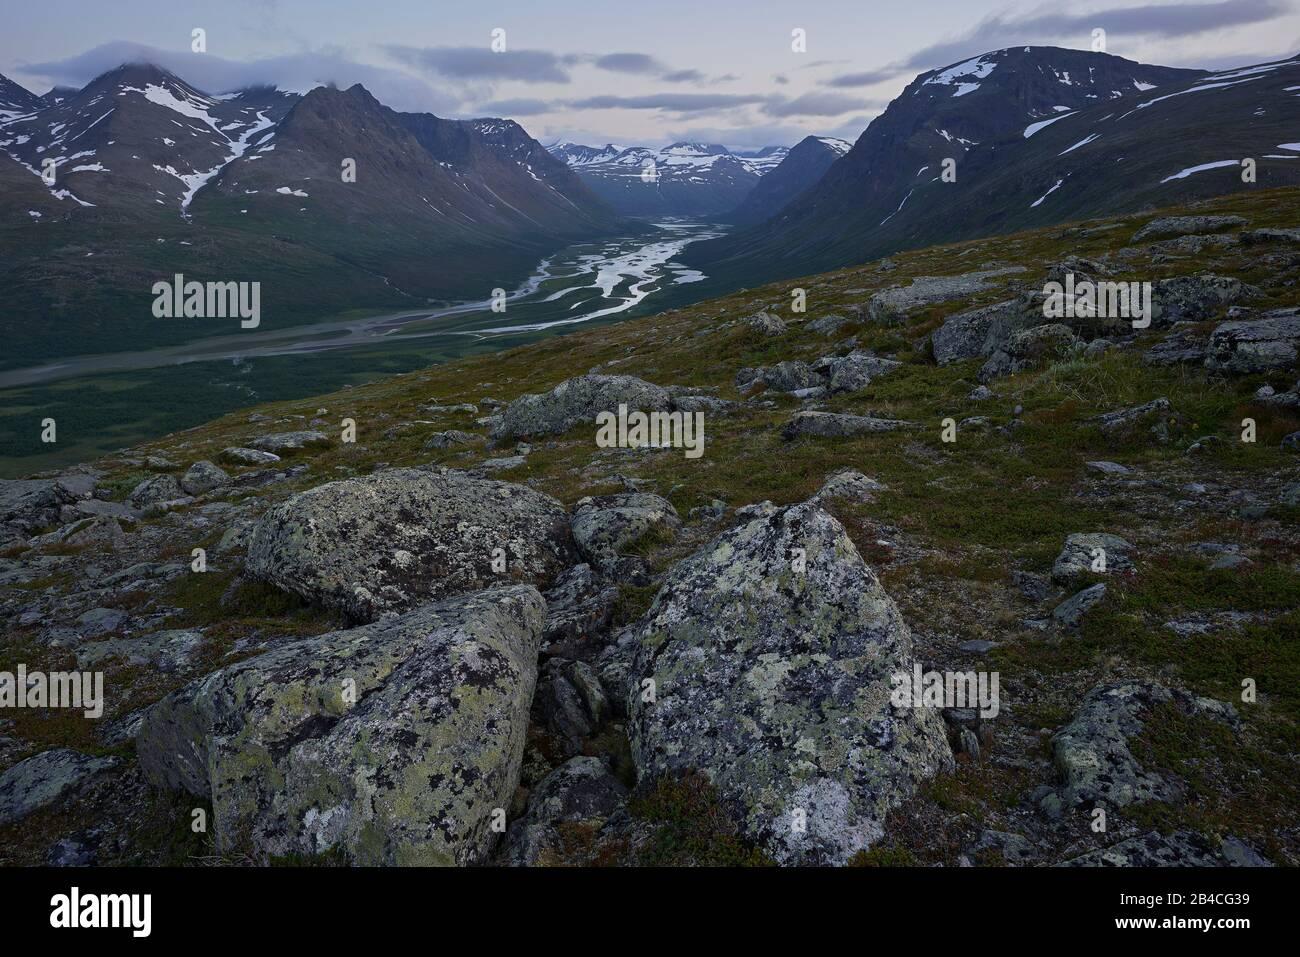 Sweden,Lapland,Sarek nationalpark, Rapaätno valley Stock Photo